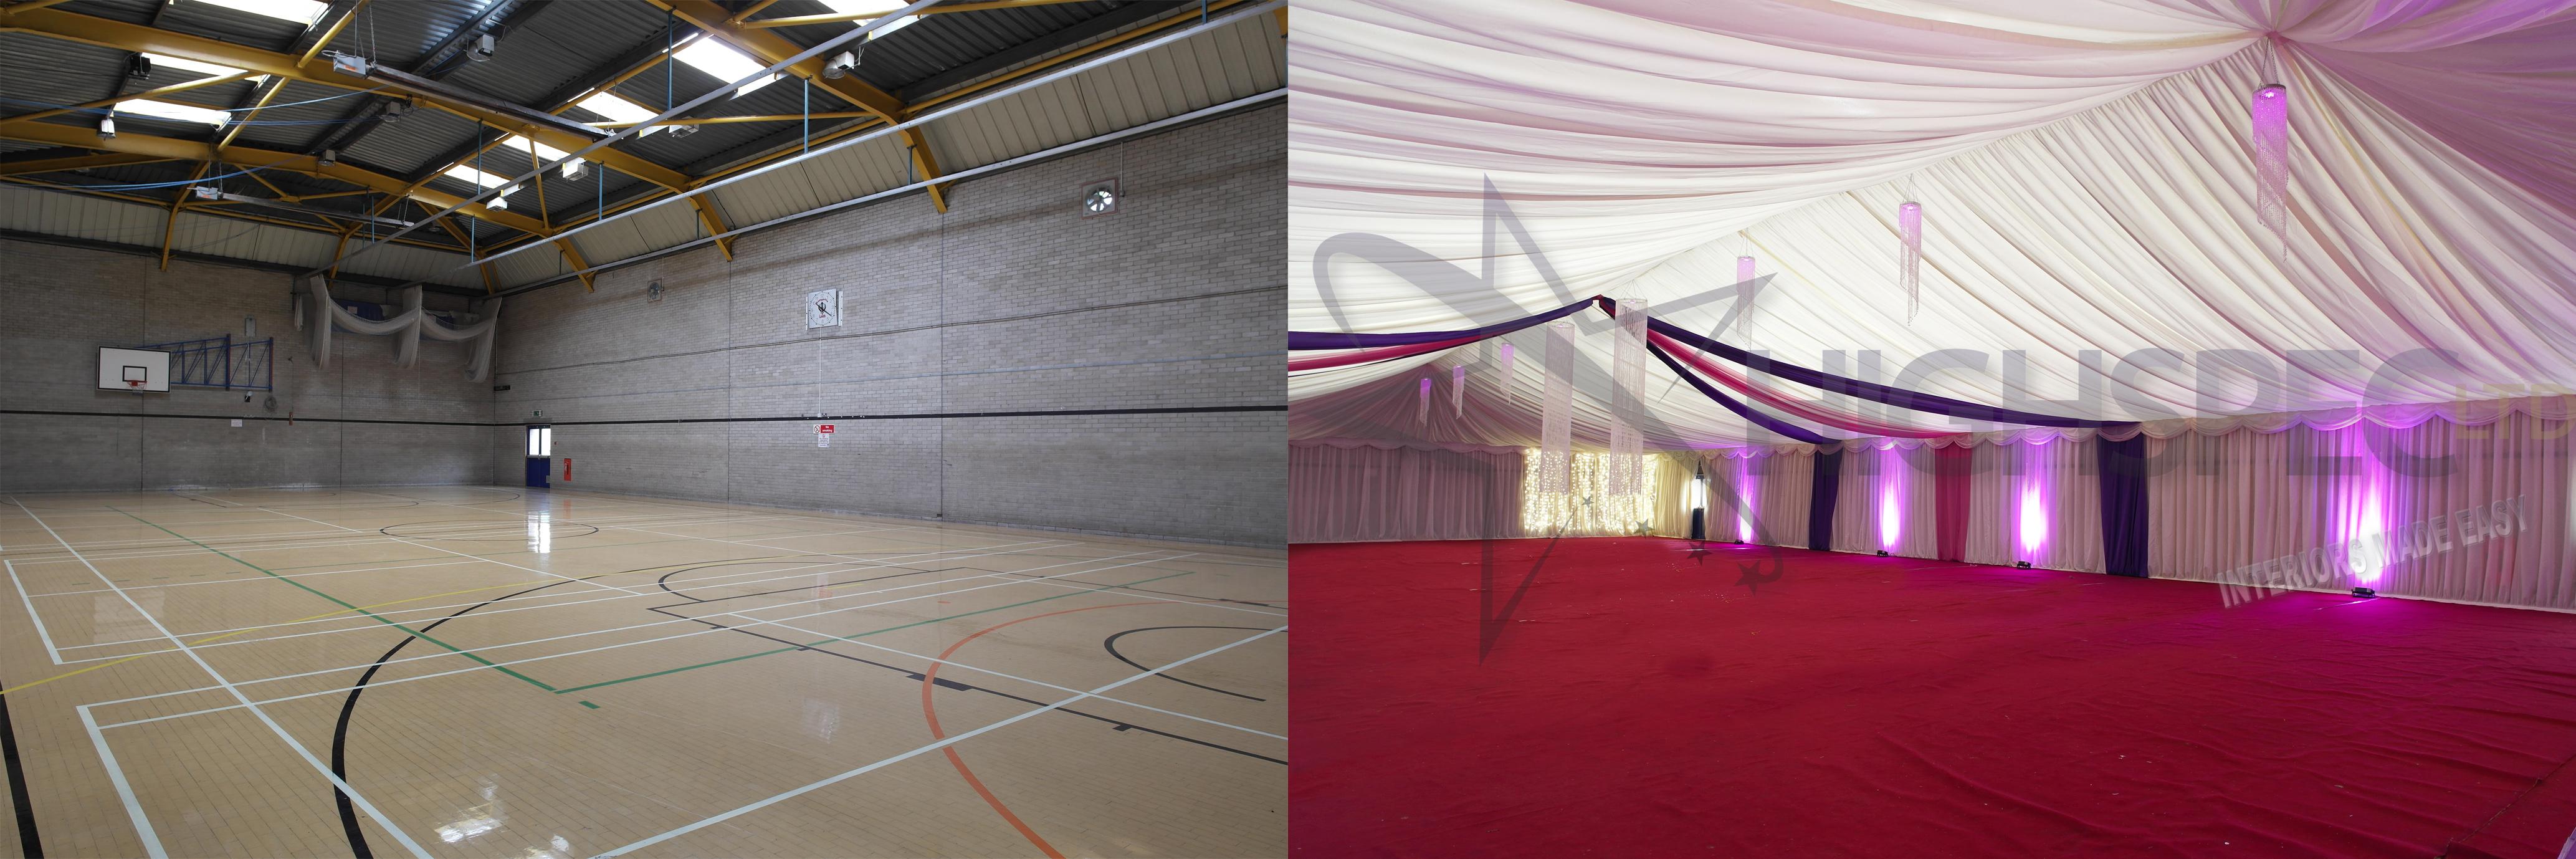 Sports hall venue lining